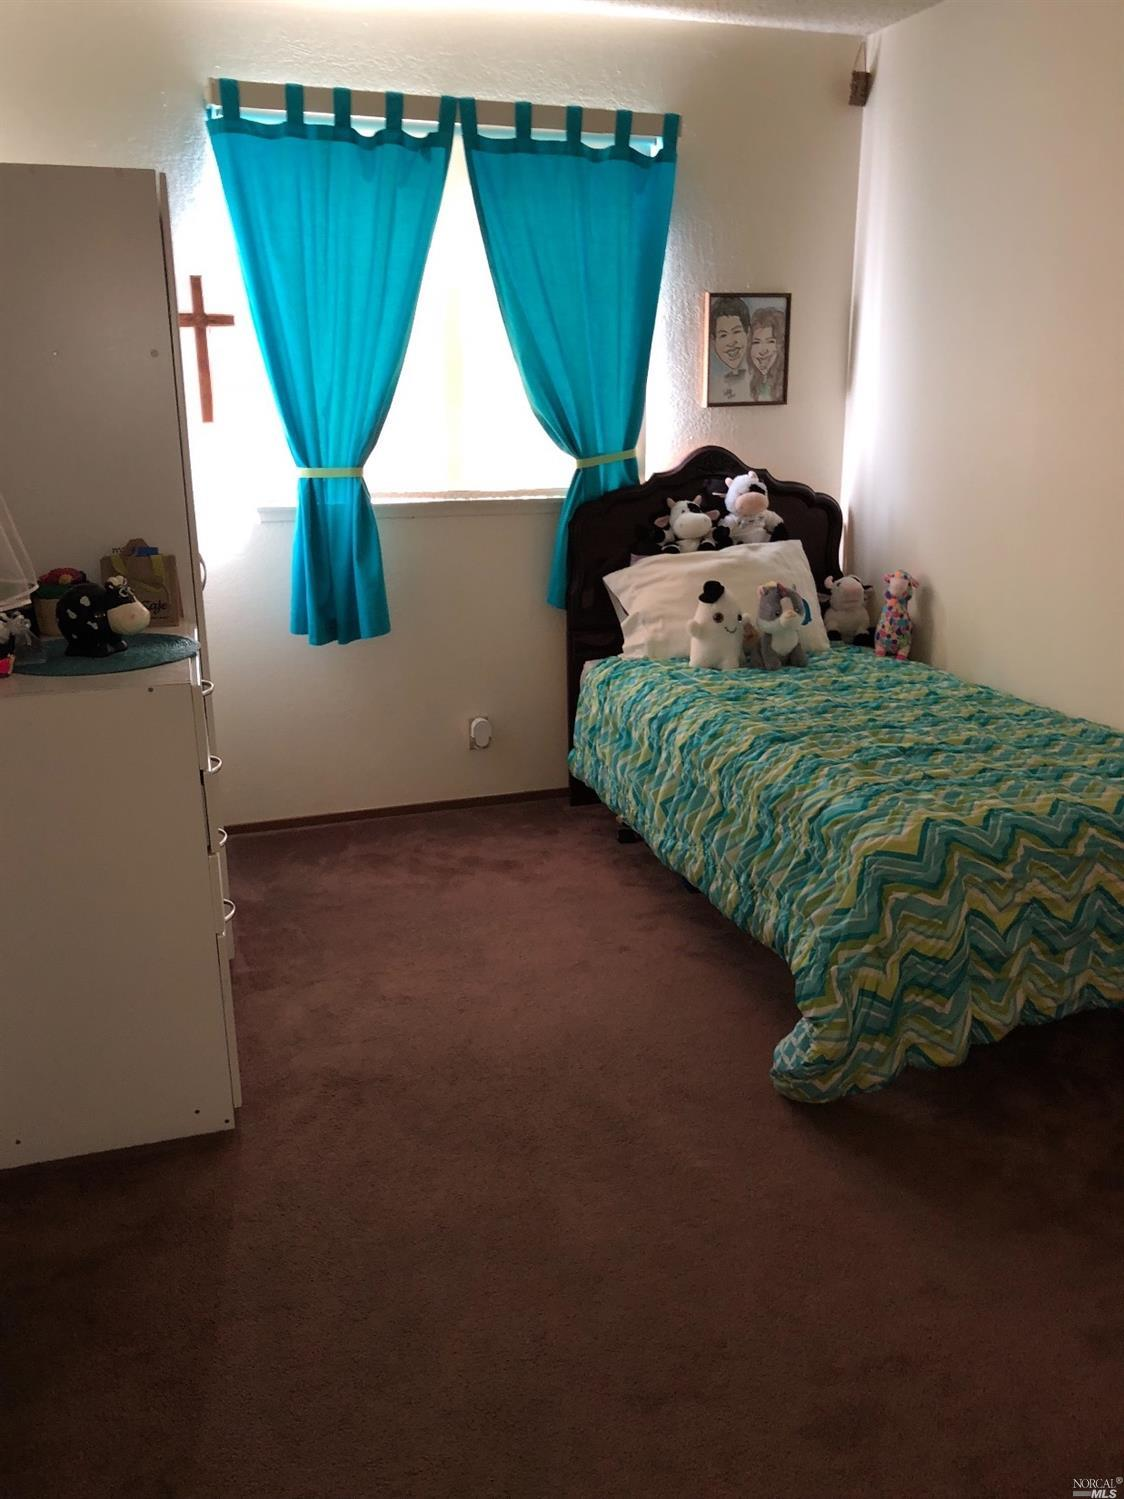 929 HIDDEN COVE WAY, SUISUN CITY, CA 94585  Photo 16